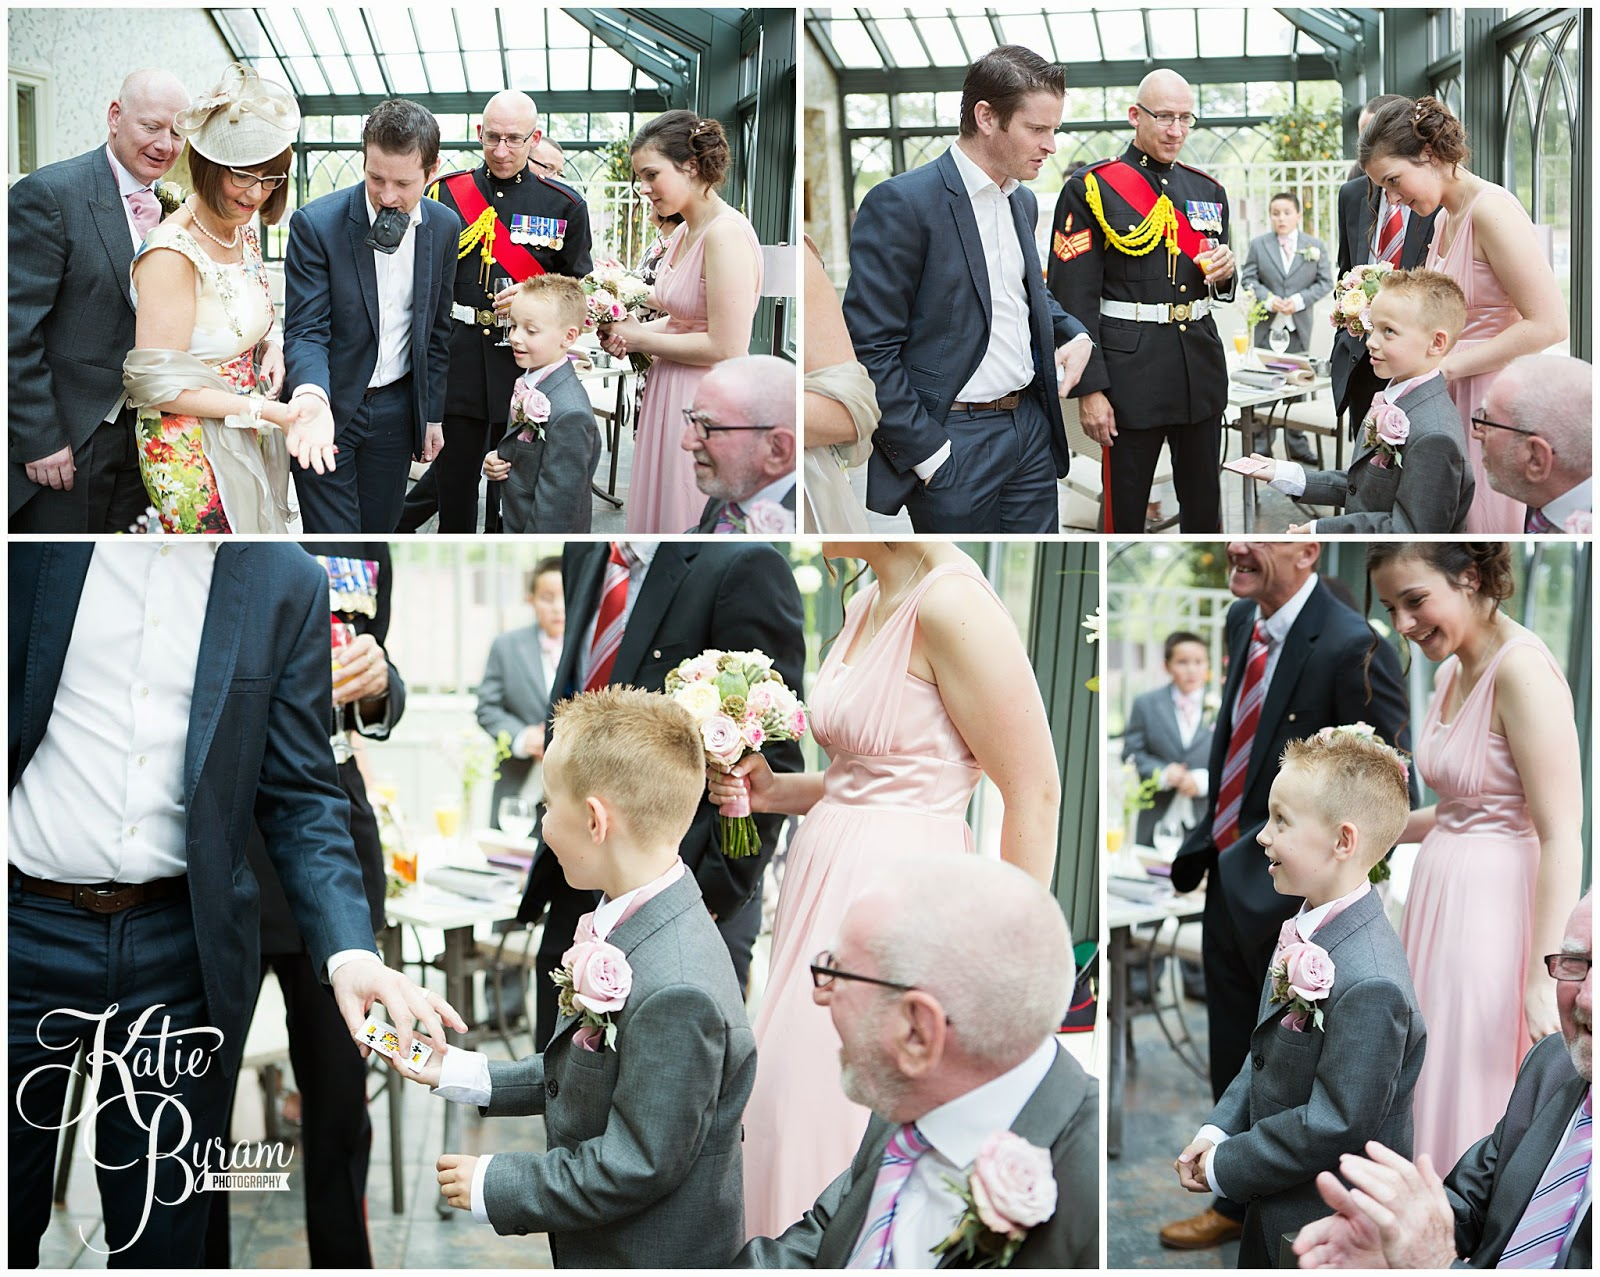 paul lytton, two bride wedding, lesbian wedding, lgbt wedding, gisborough hall wedding, north yorkshire wedding photographer, katie byram photographer, same-sex couples, bex bridal, elizabeth george bridal, north yorkshire wedding venues